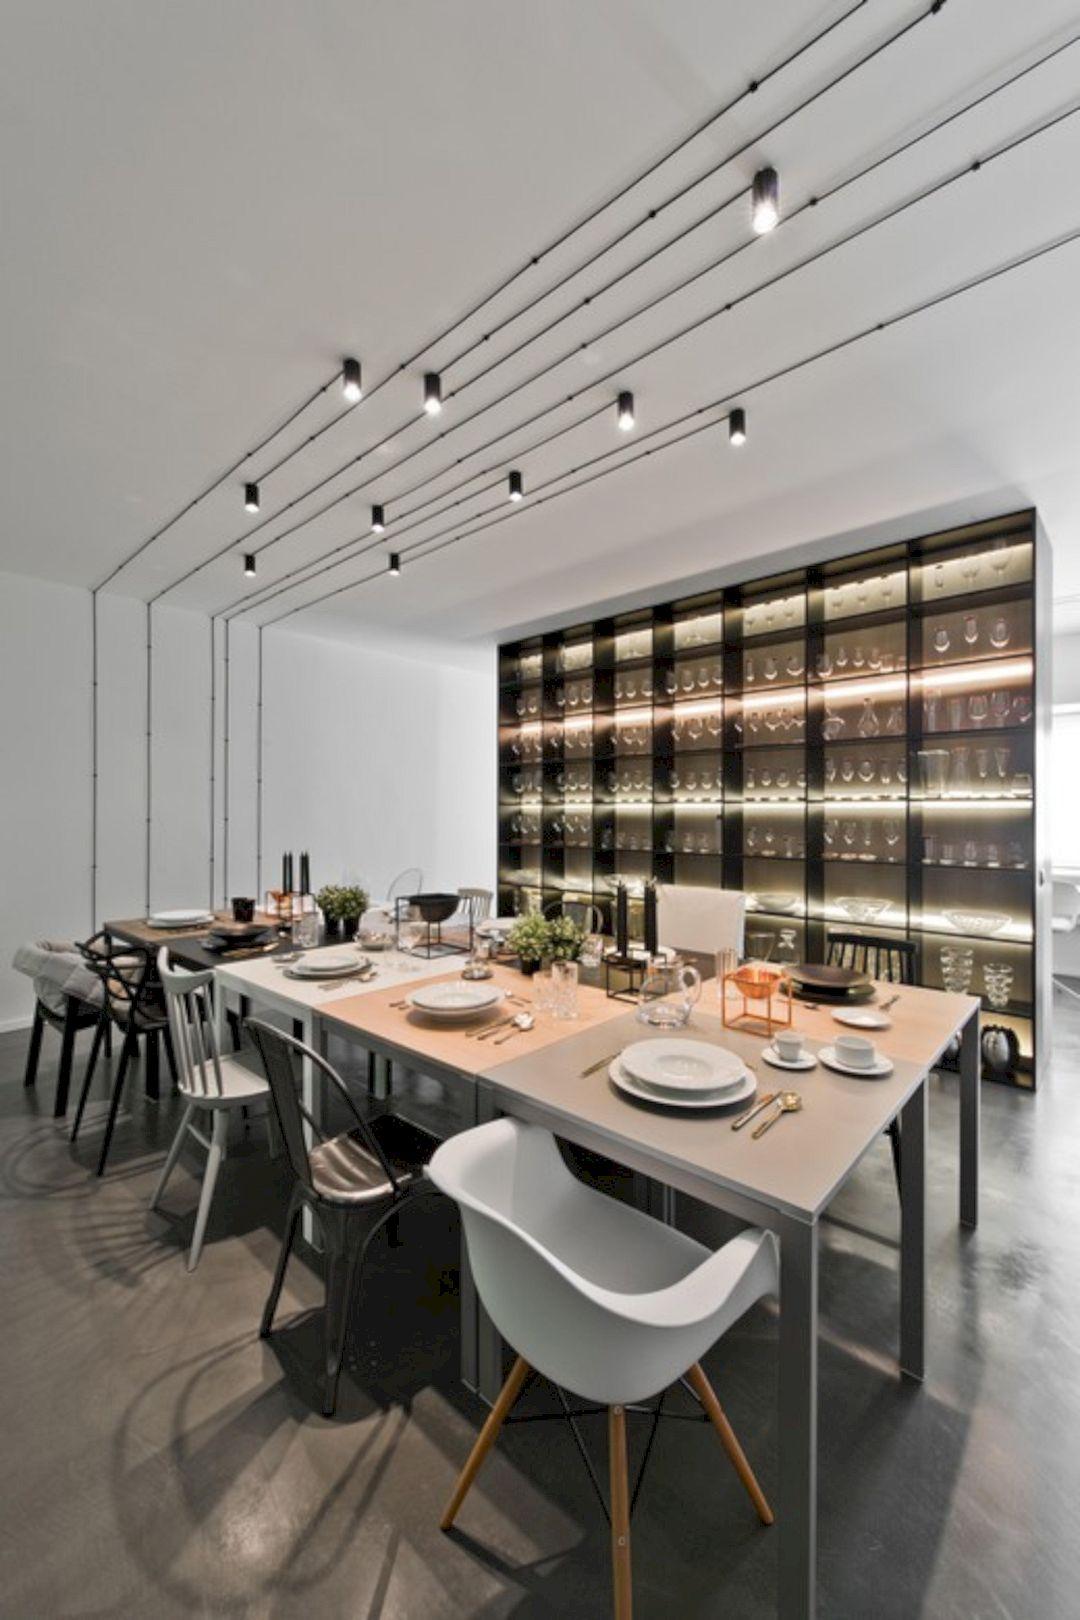 49 Stunning Office Interior Design Inspirations